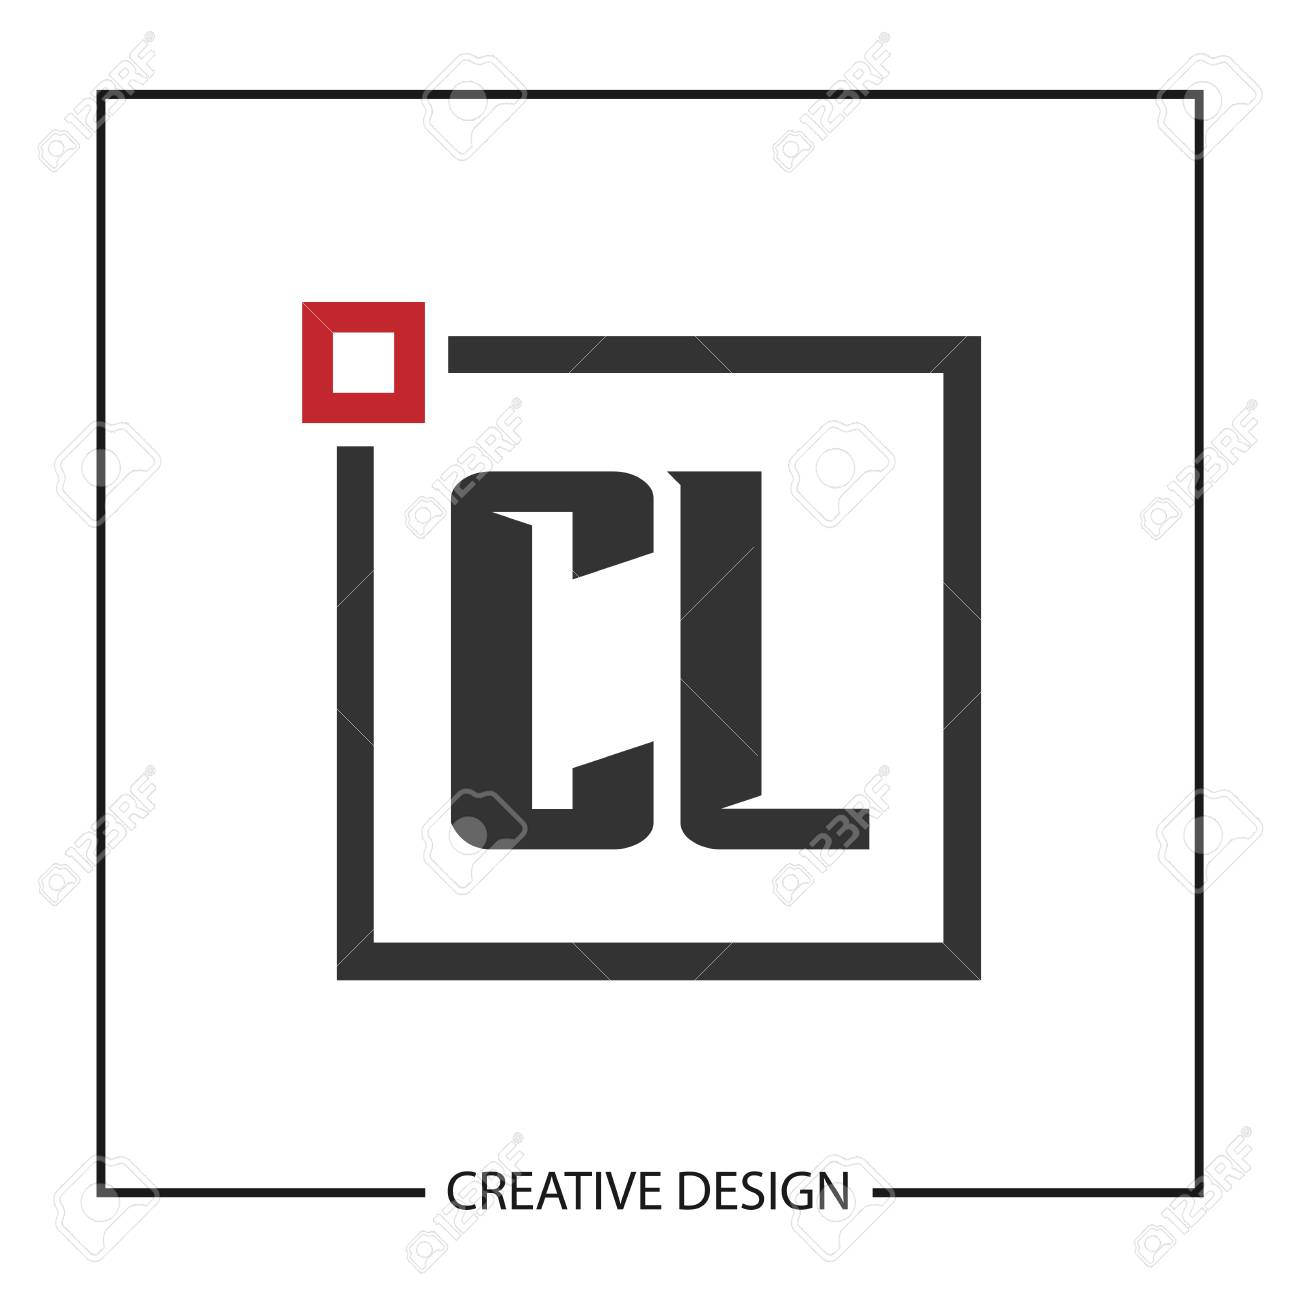 Initial Letter CL Logo Template Design Vector Illustration - 113873295